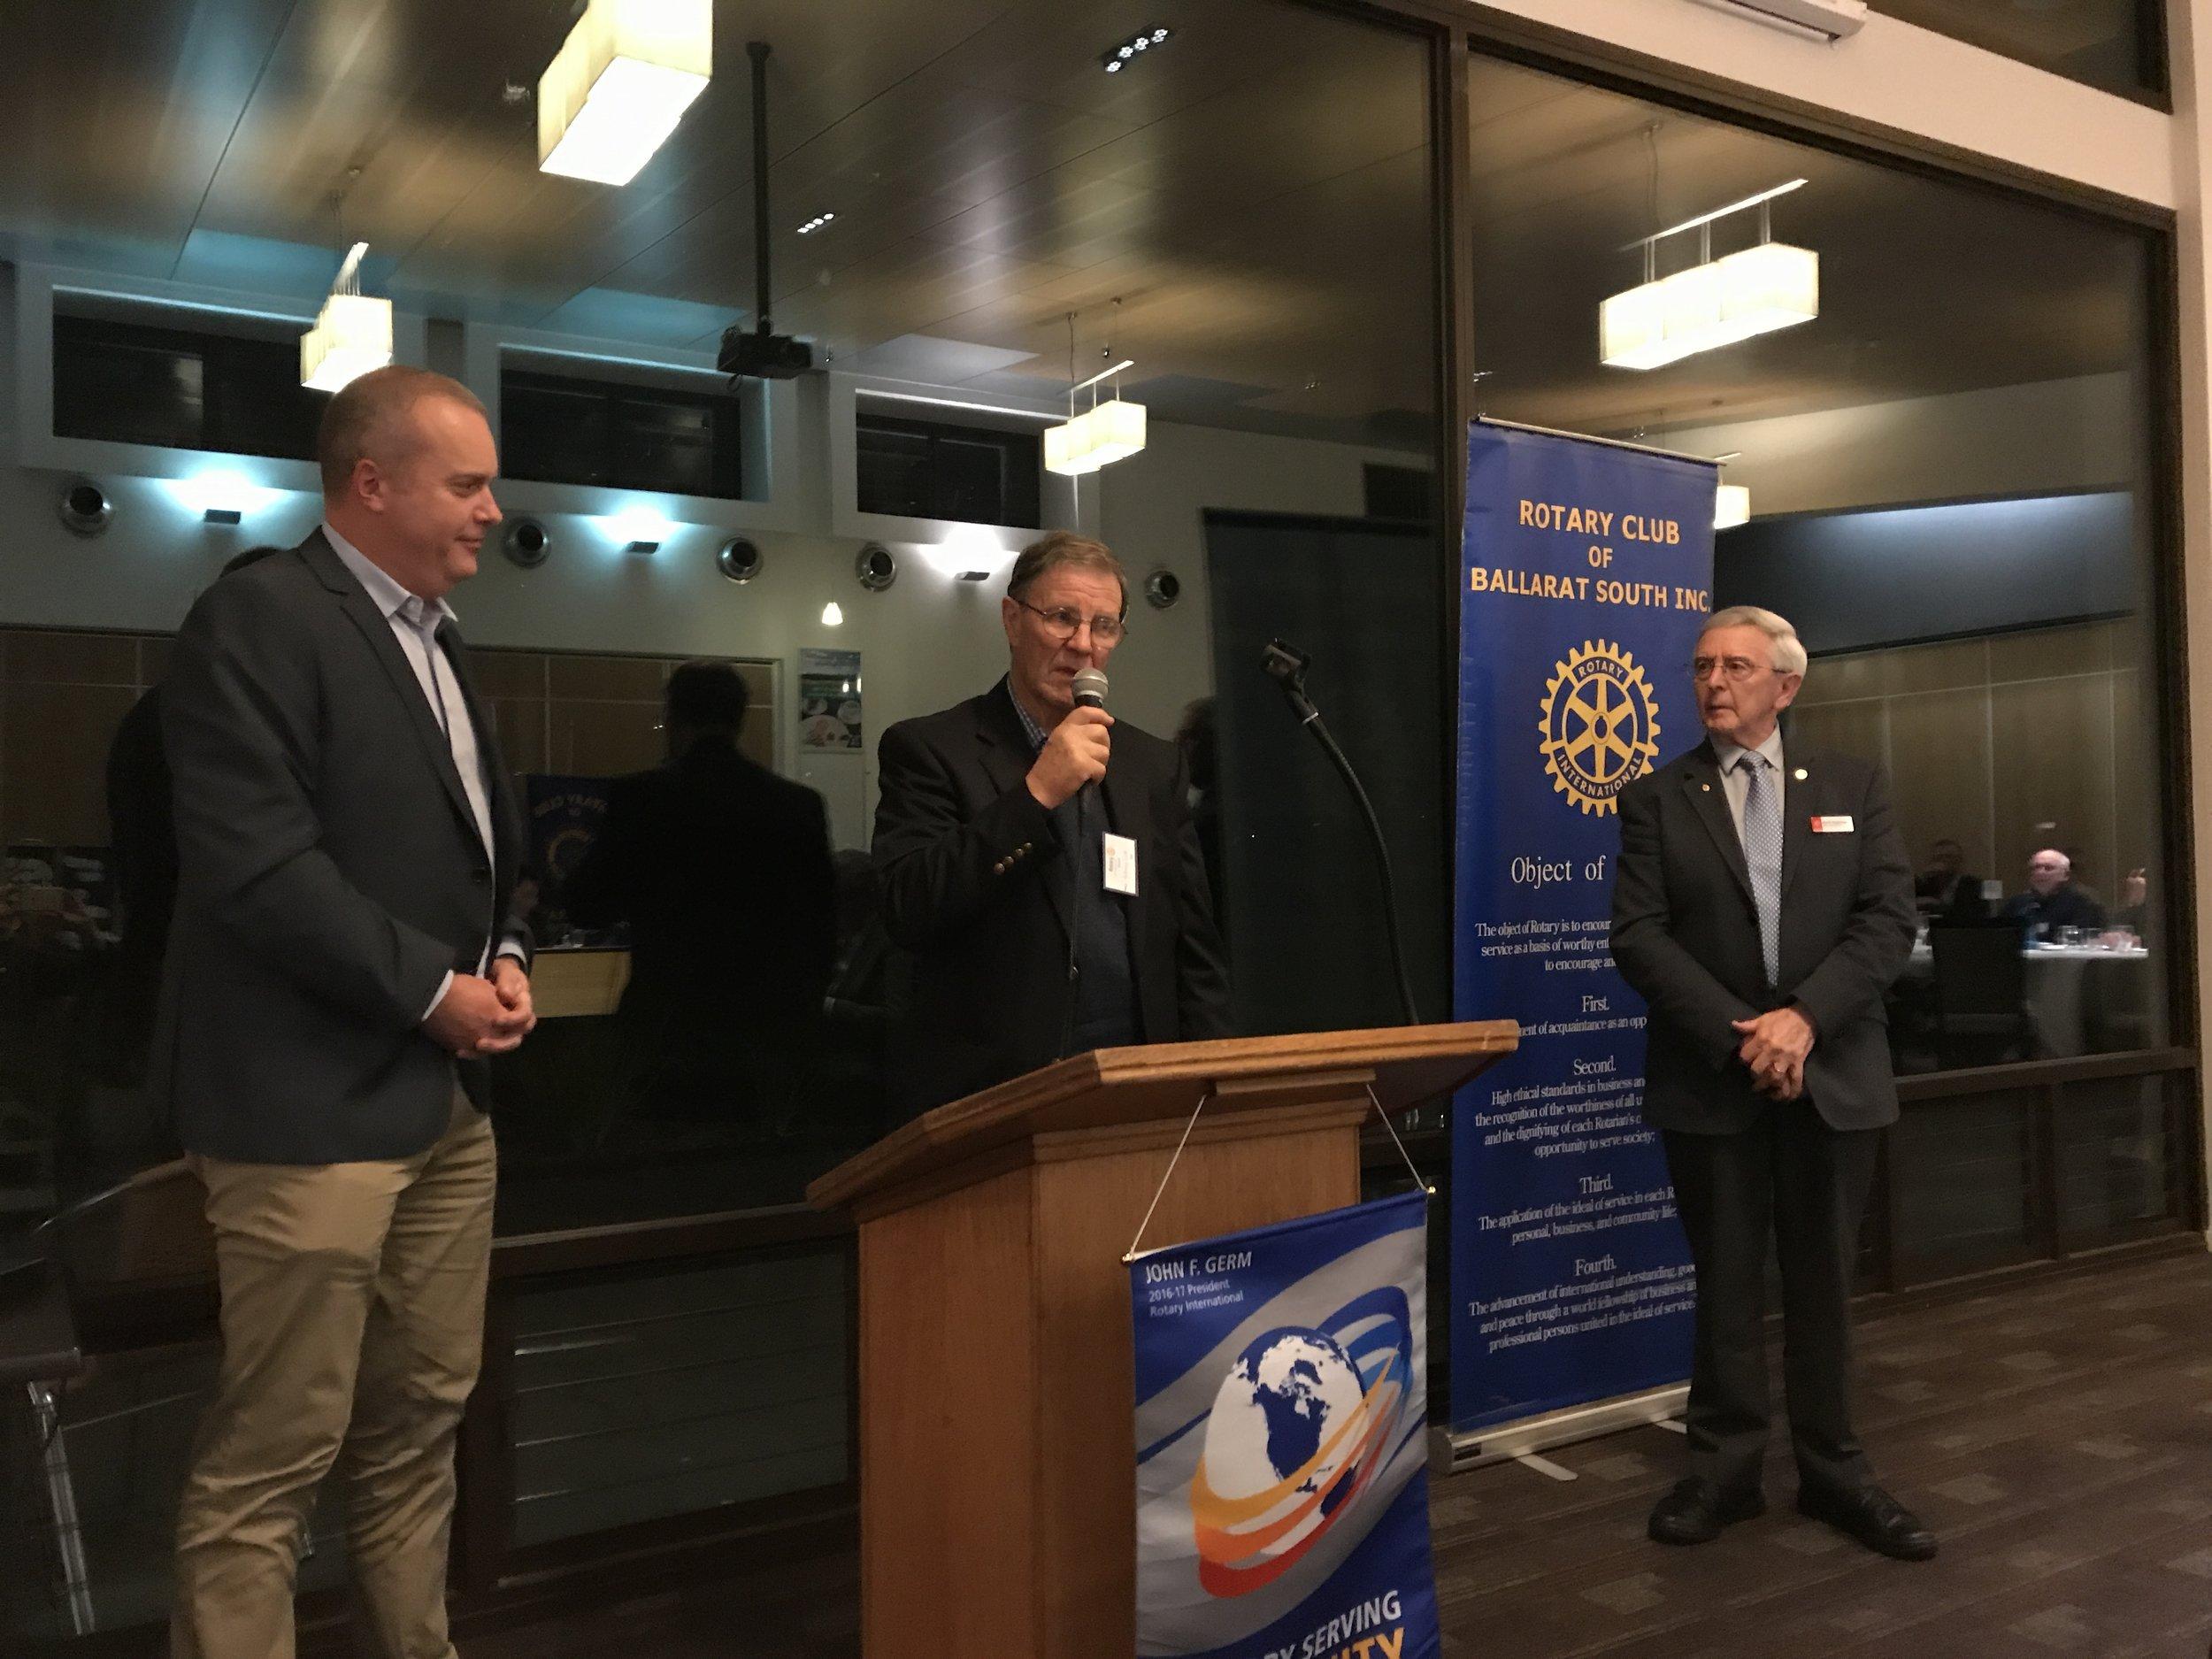 Brett Macdonald, Dr Tony Cole and Denis Bateman